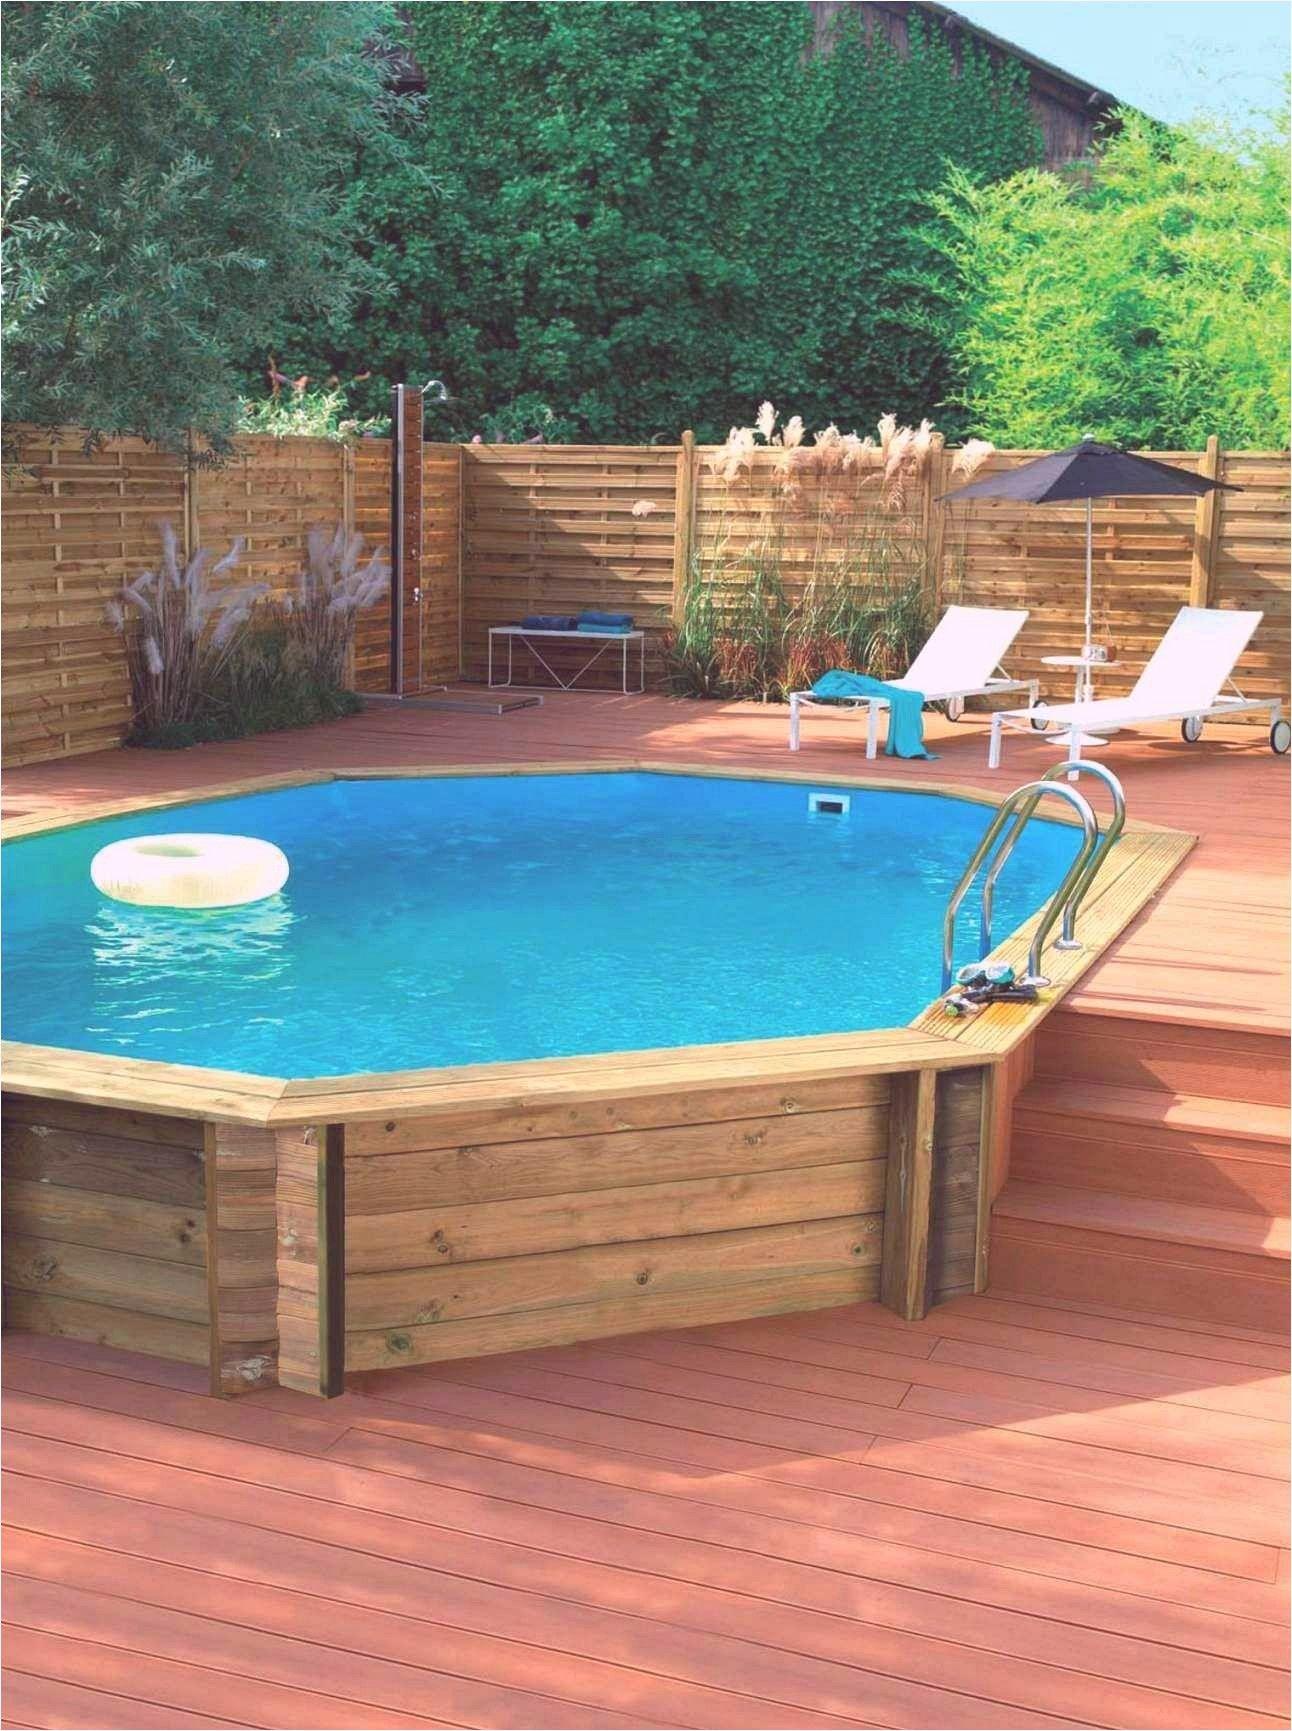 35 Small Backyard Swimming Pool Designs Ideas You Ll Love Homelovers Piscinas Madera Piscinas Pequeñas Piscinas